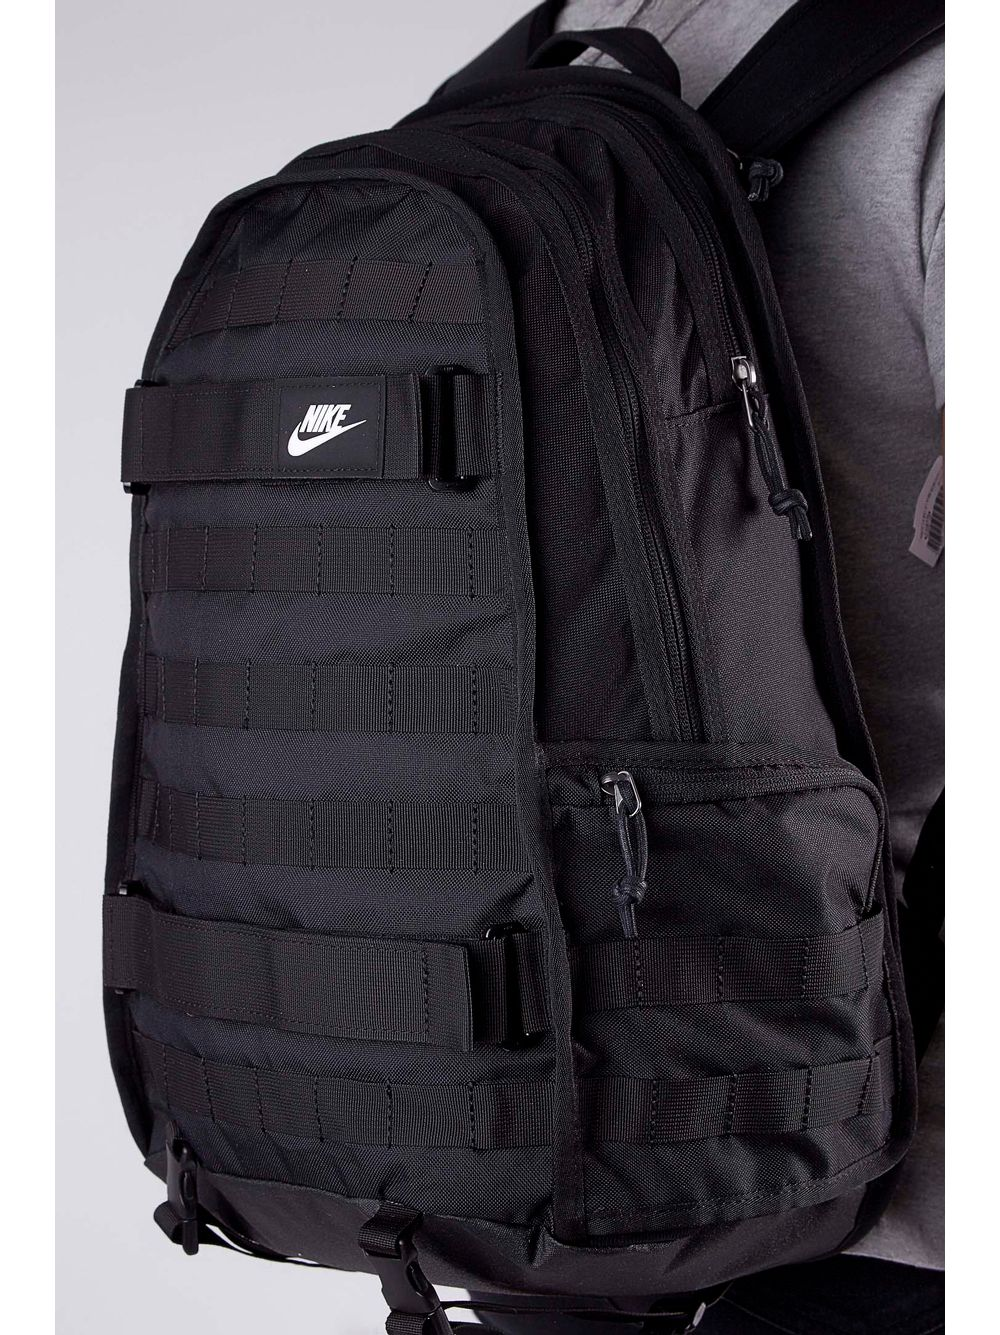 90cb5066d Previous. Mochila-Nike-Sportswear-Rpm-Backpack-Preto ...